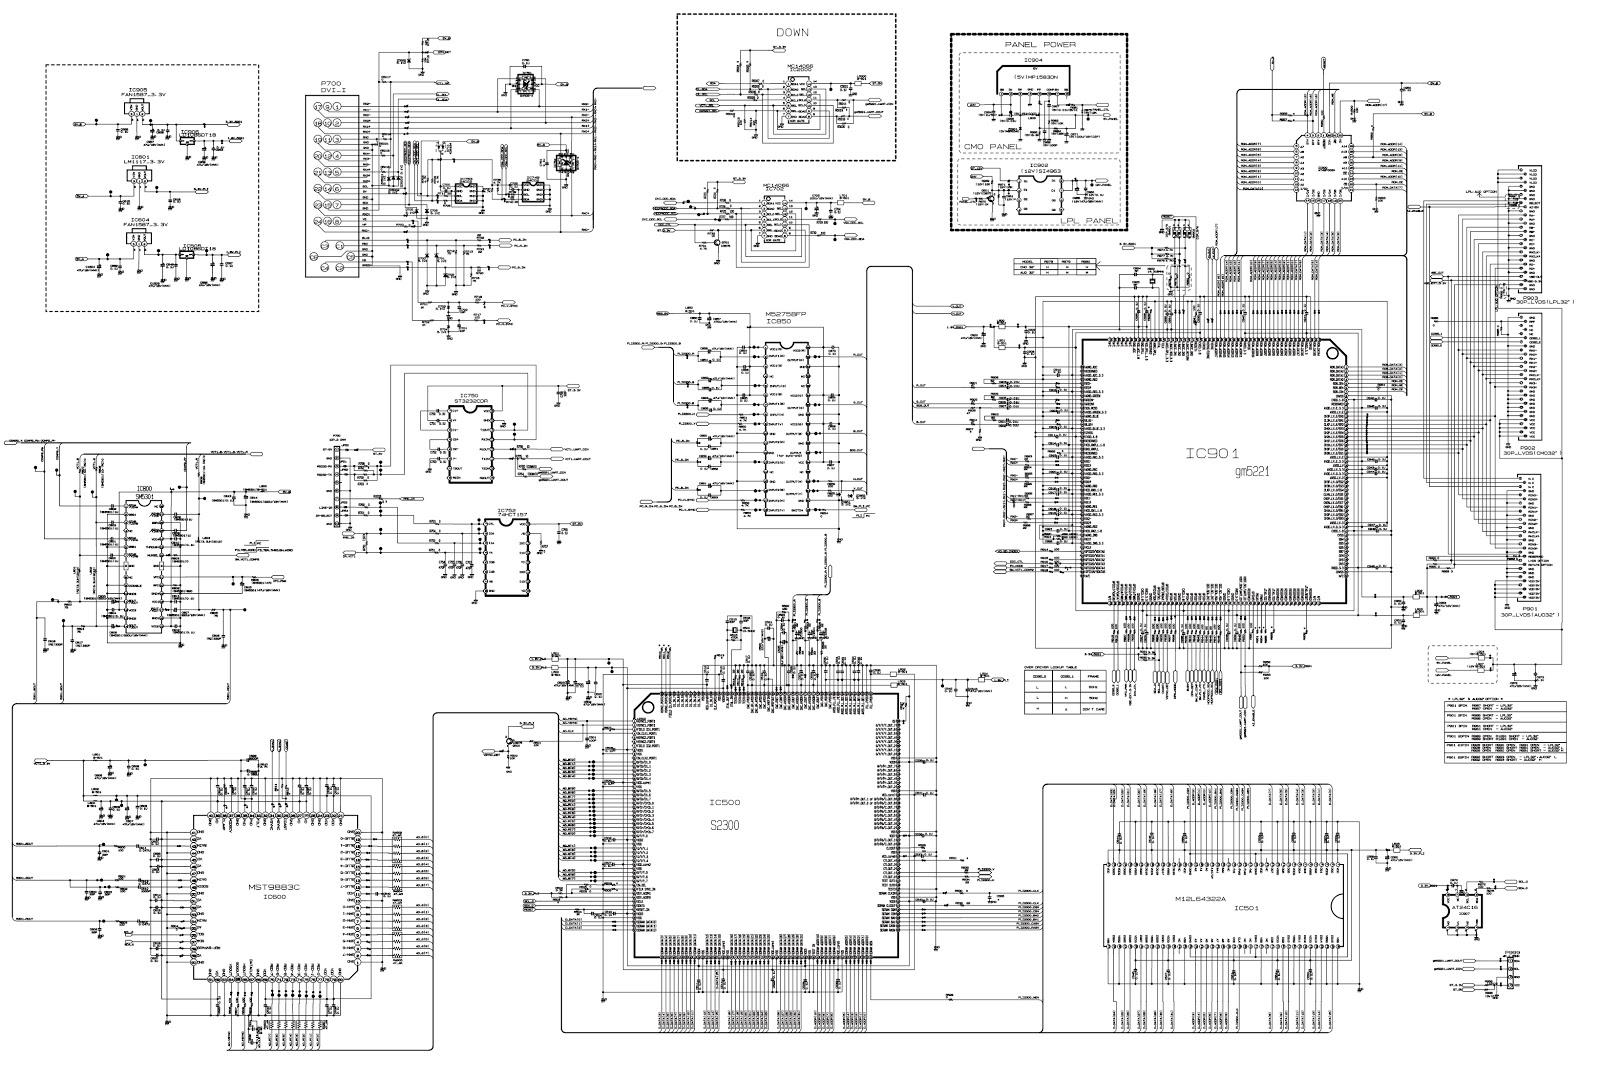 lg rz23lz55 lcd tv schematic circuit diagram schematic diagrams rh schematicscom blogspot com [ 1600 x 1081 Pixel ]